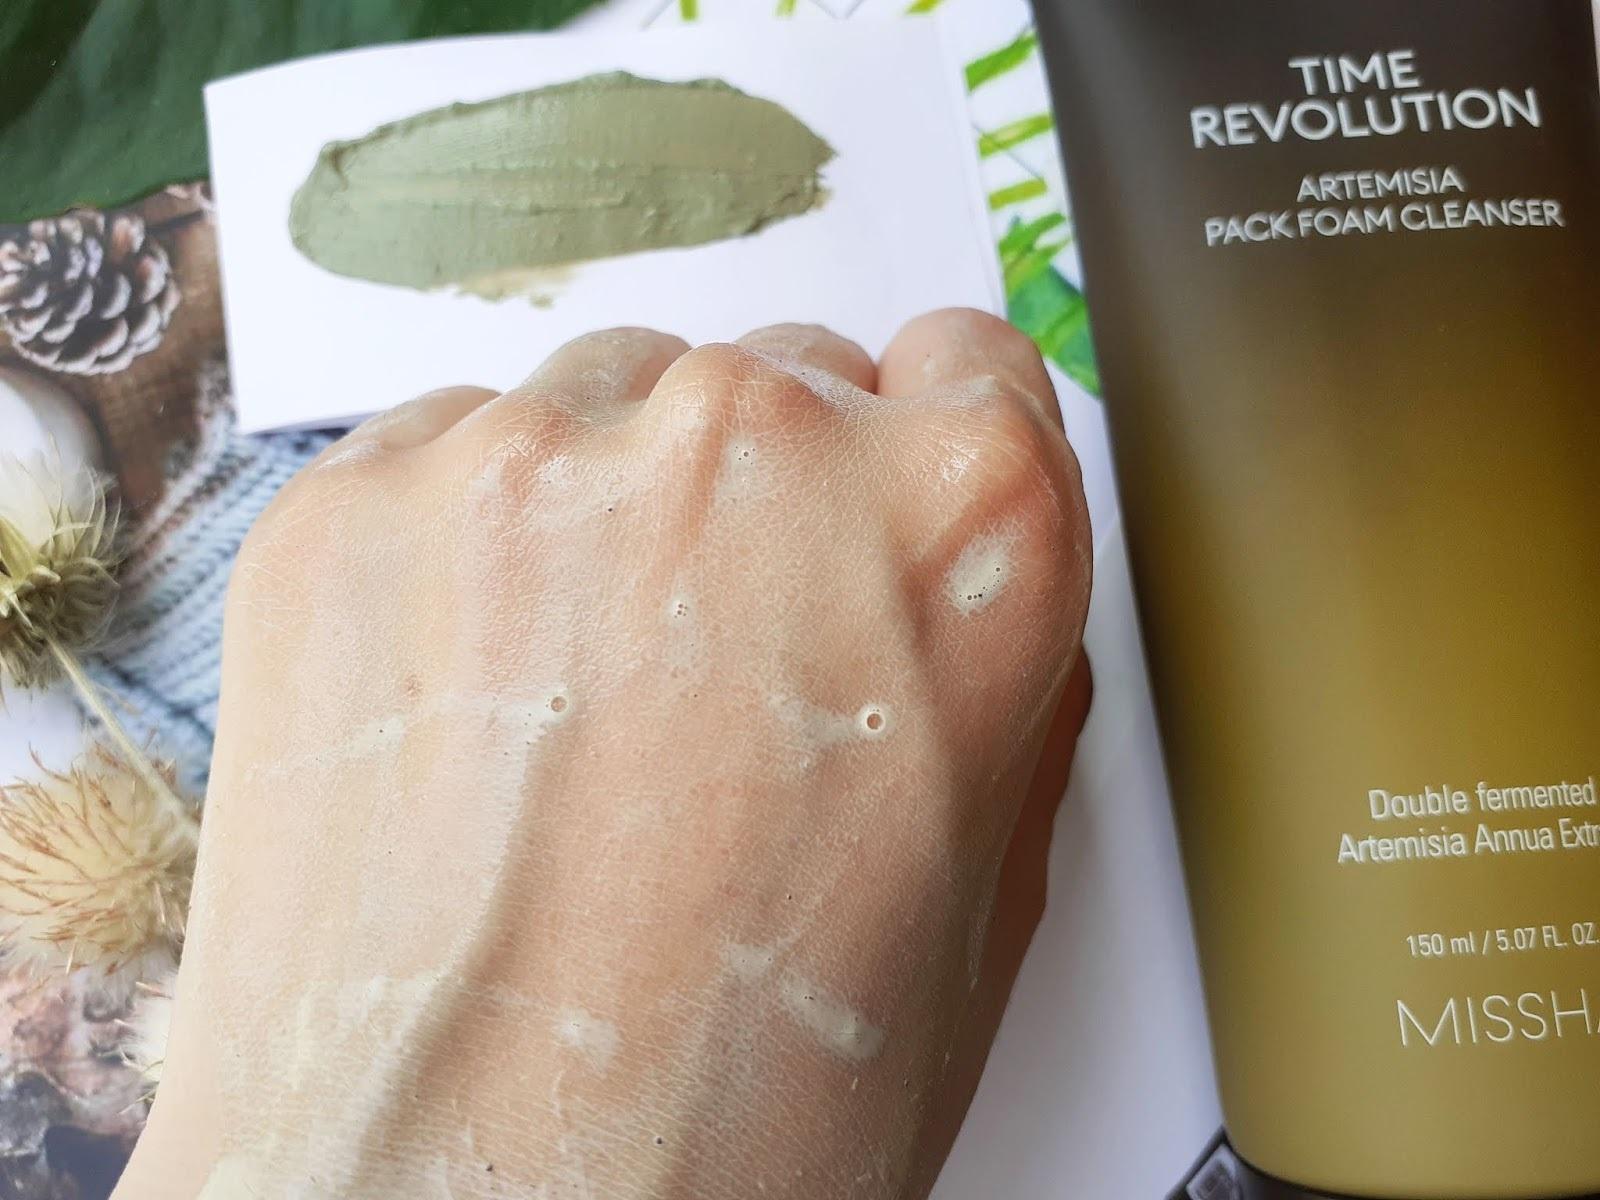 Sữa Rửa Mặt Tạo Bọt Kiêm Mặt Nạ Đất Sét Chiết Xuất Ngải Cứu Missha Time Revolution Artemisia Pack Foam Cleanser